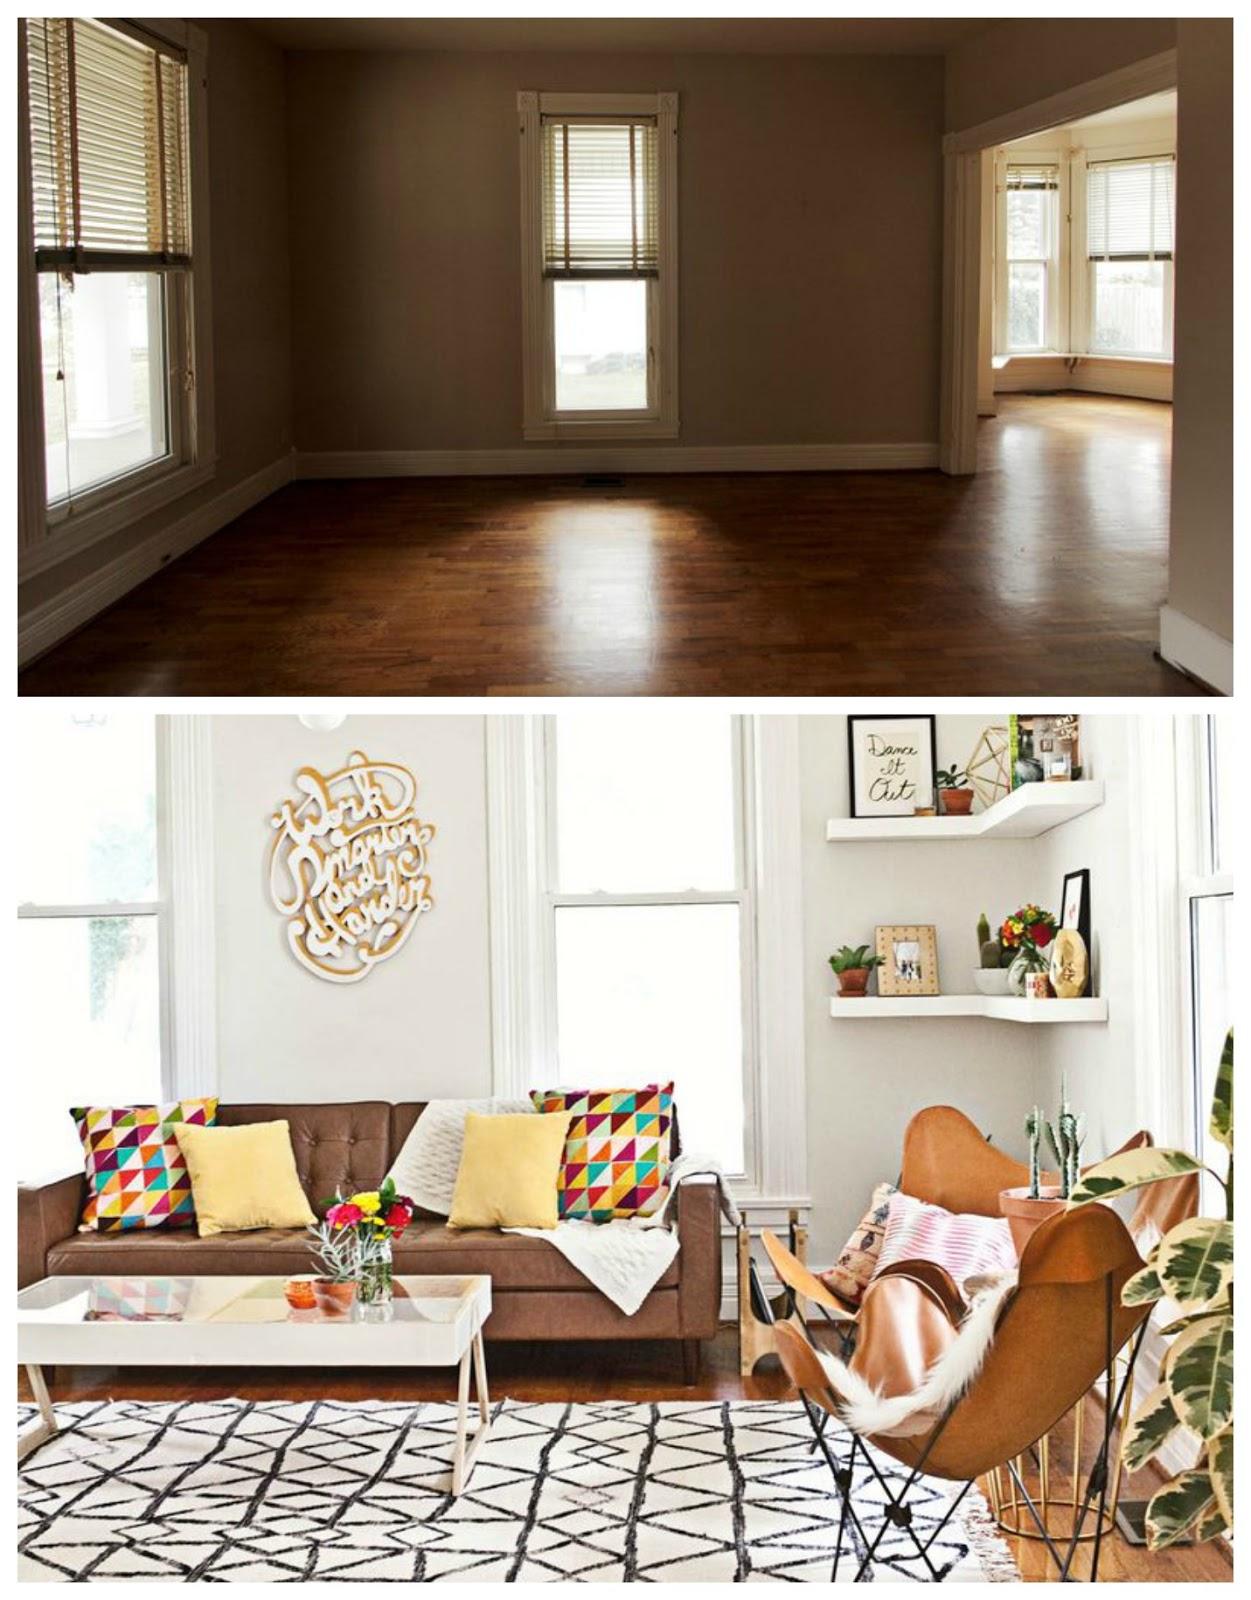 Objetos Decoracion Salon Trendy Saln Muebles Cuero Decoracion